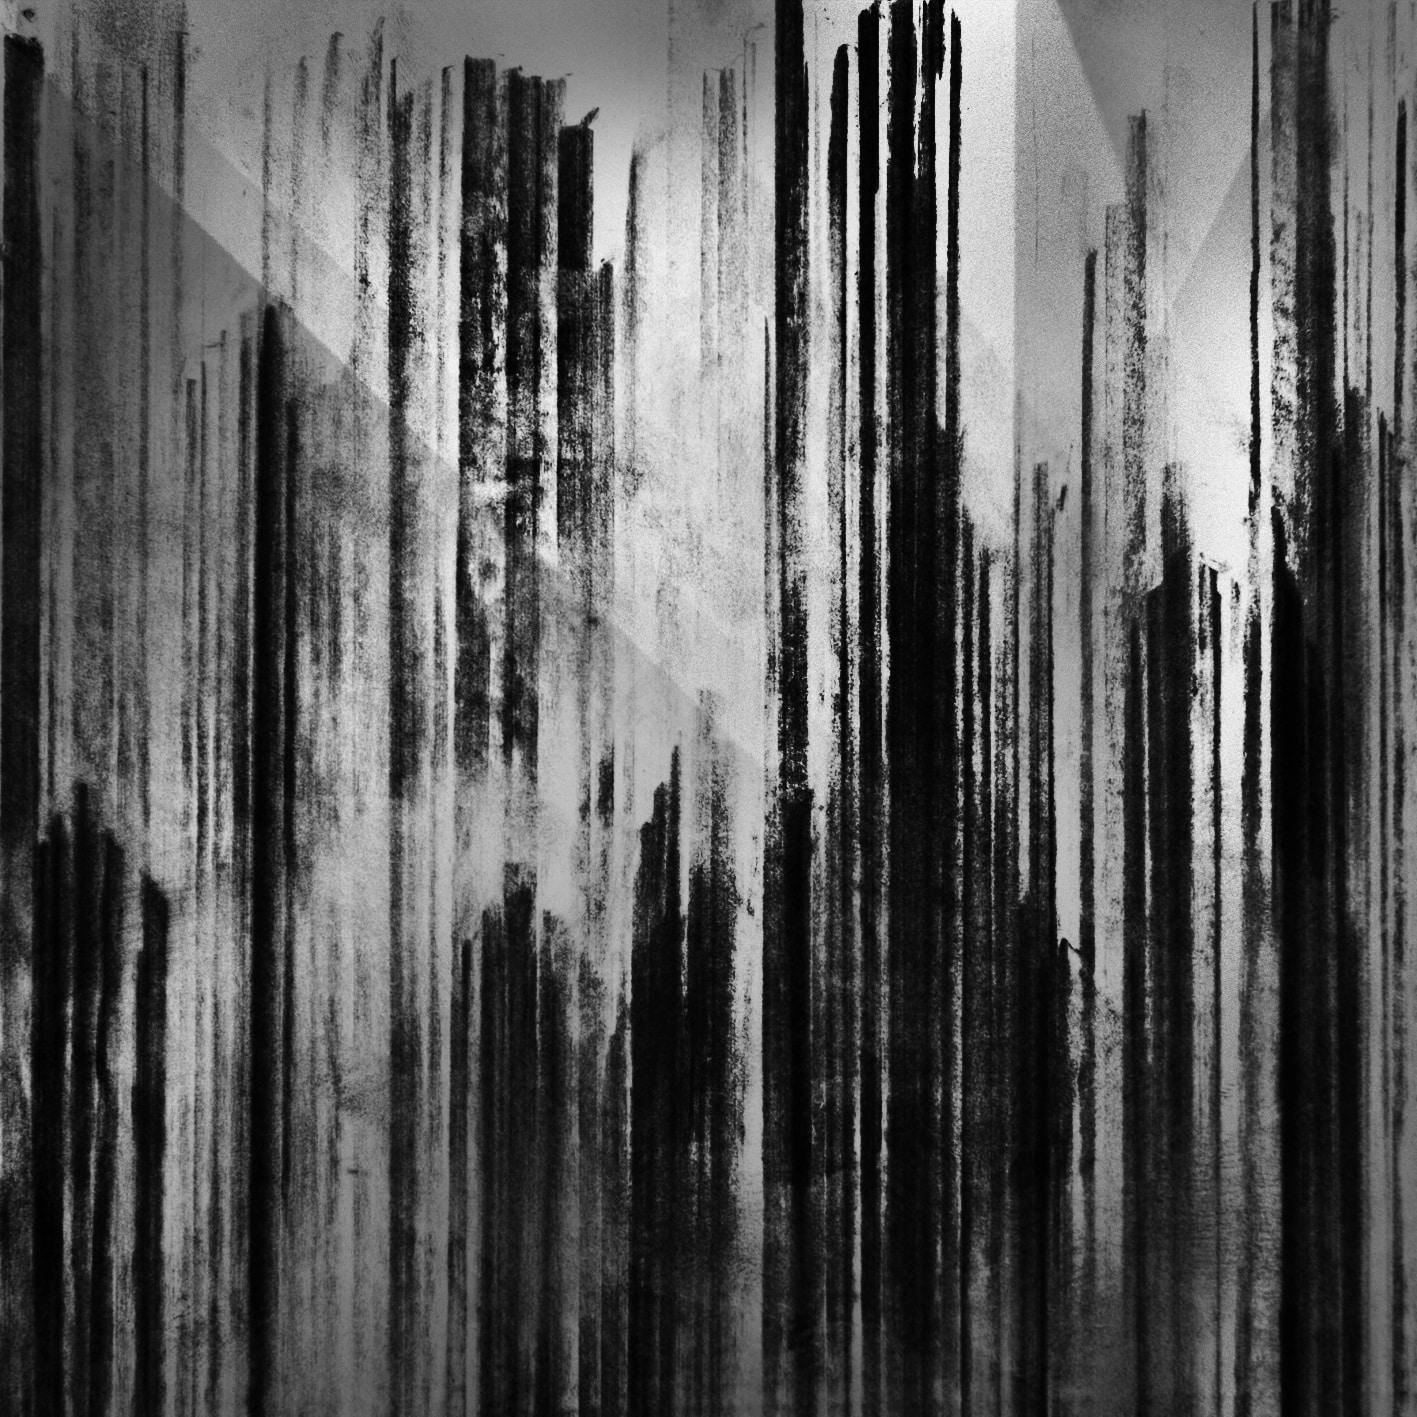 CD Review: Cult Of Luna - Vertikal